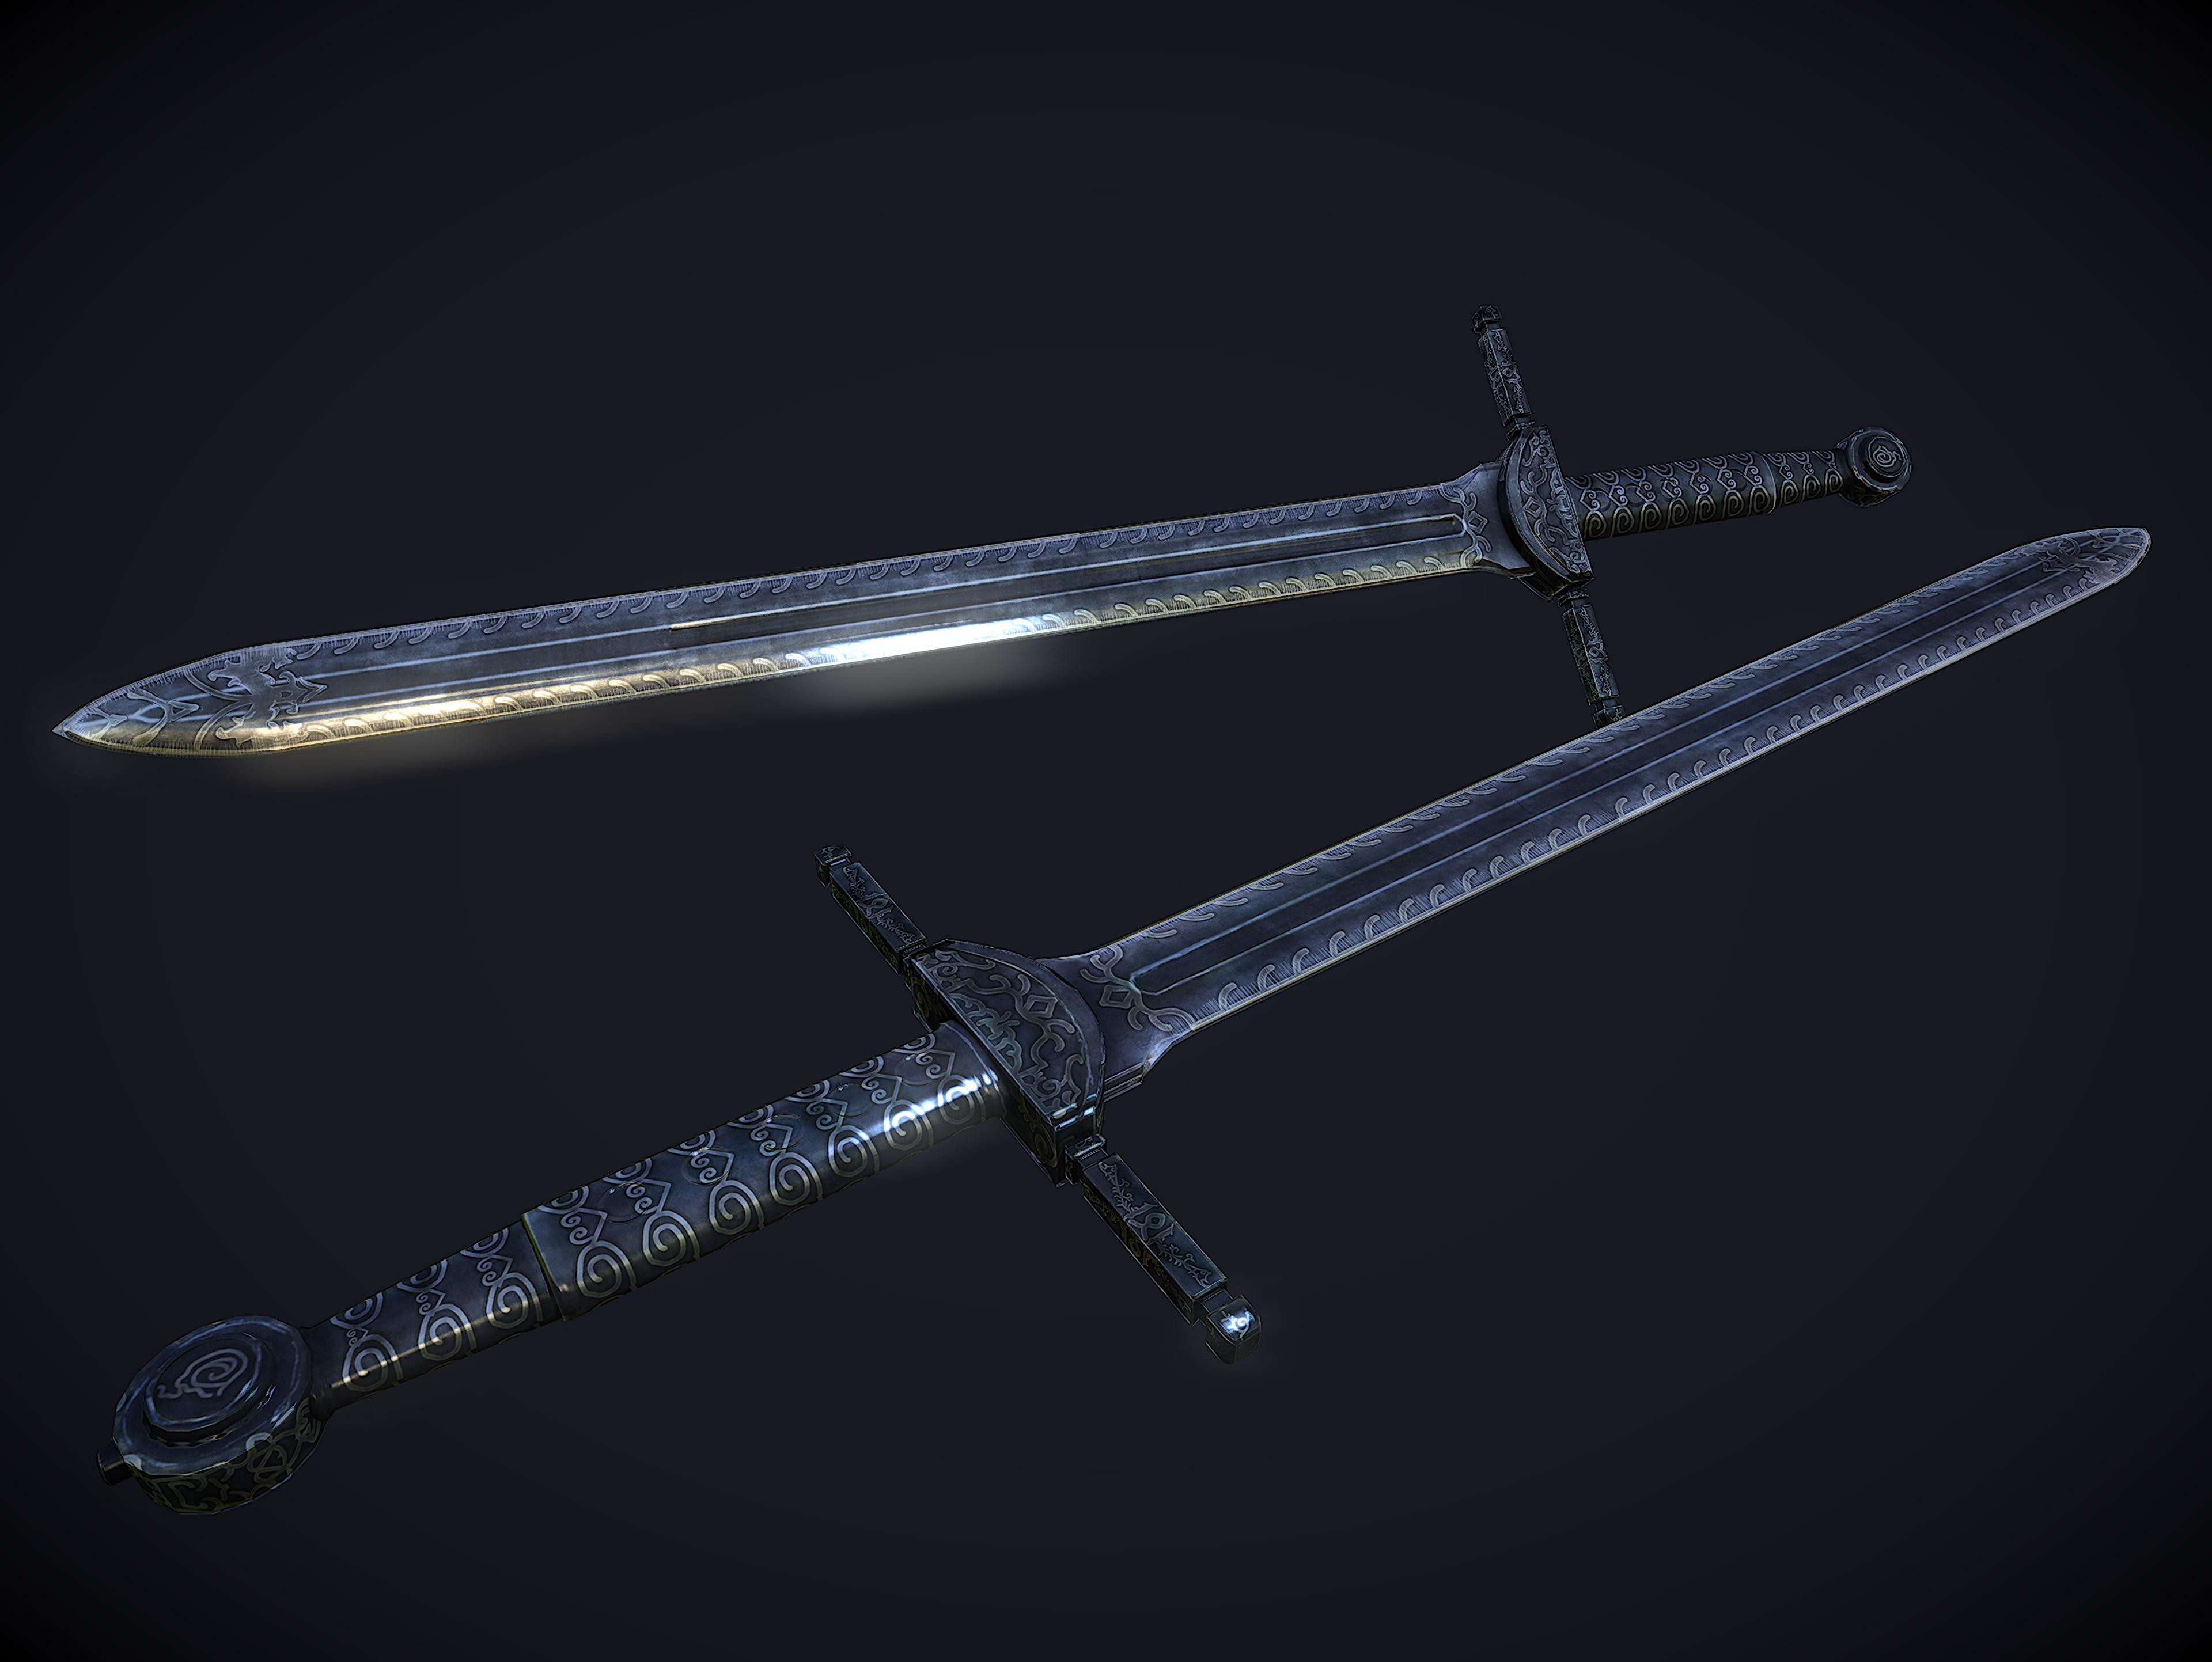 ebony sword skyrim - photo #16